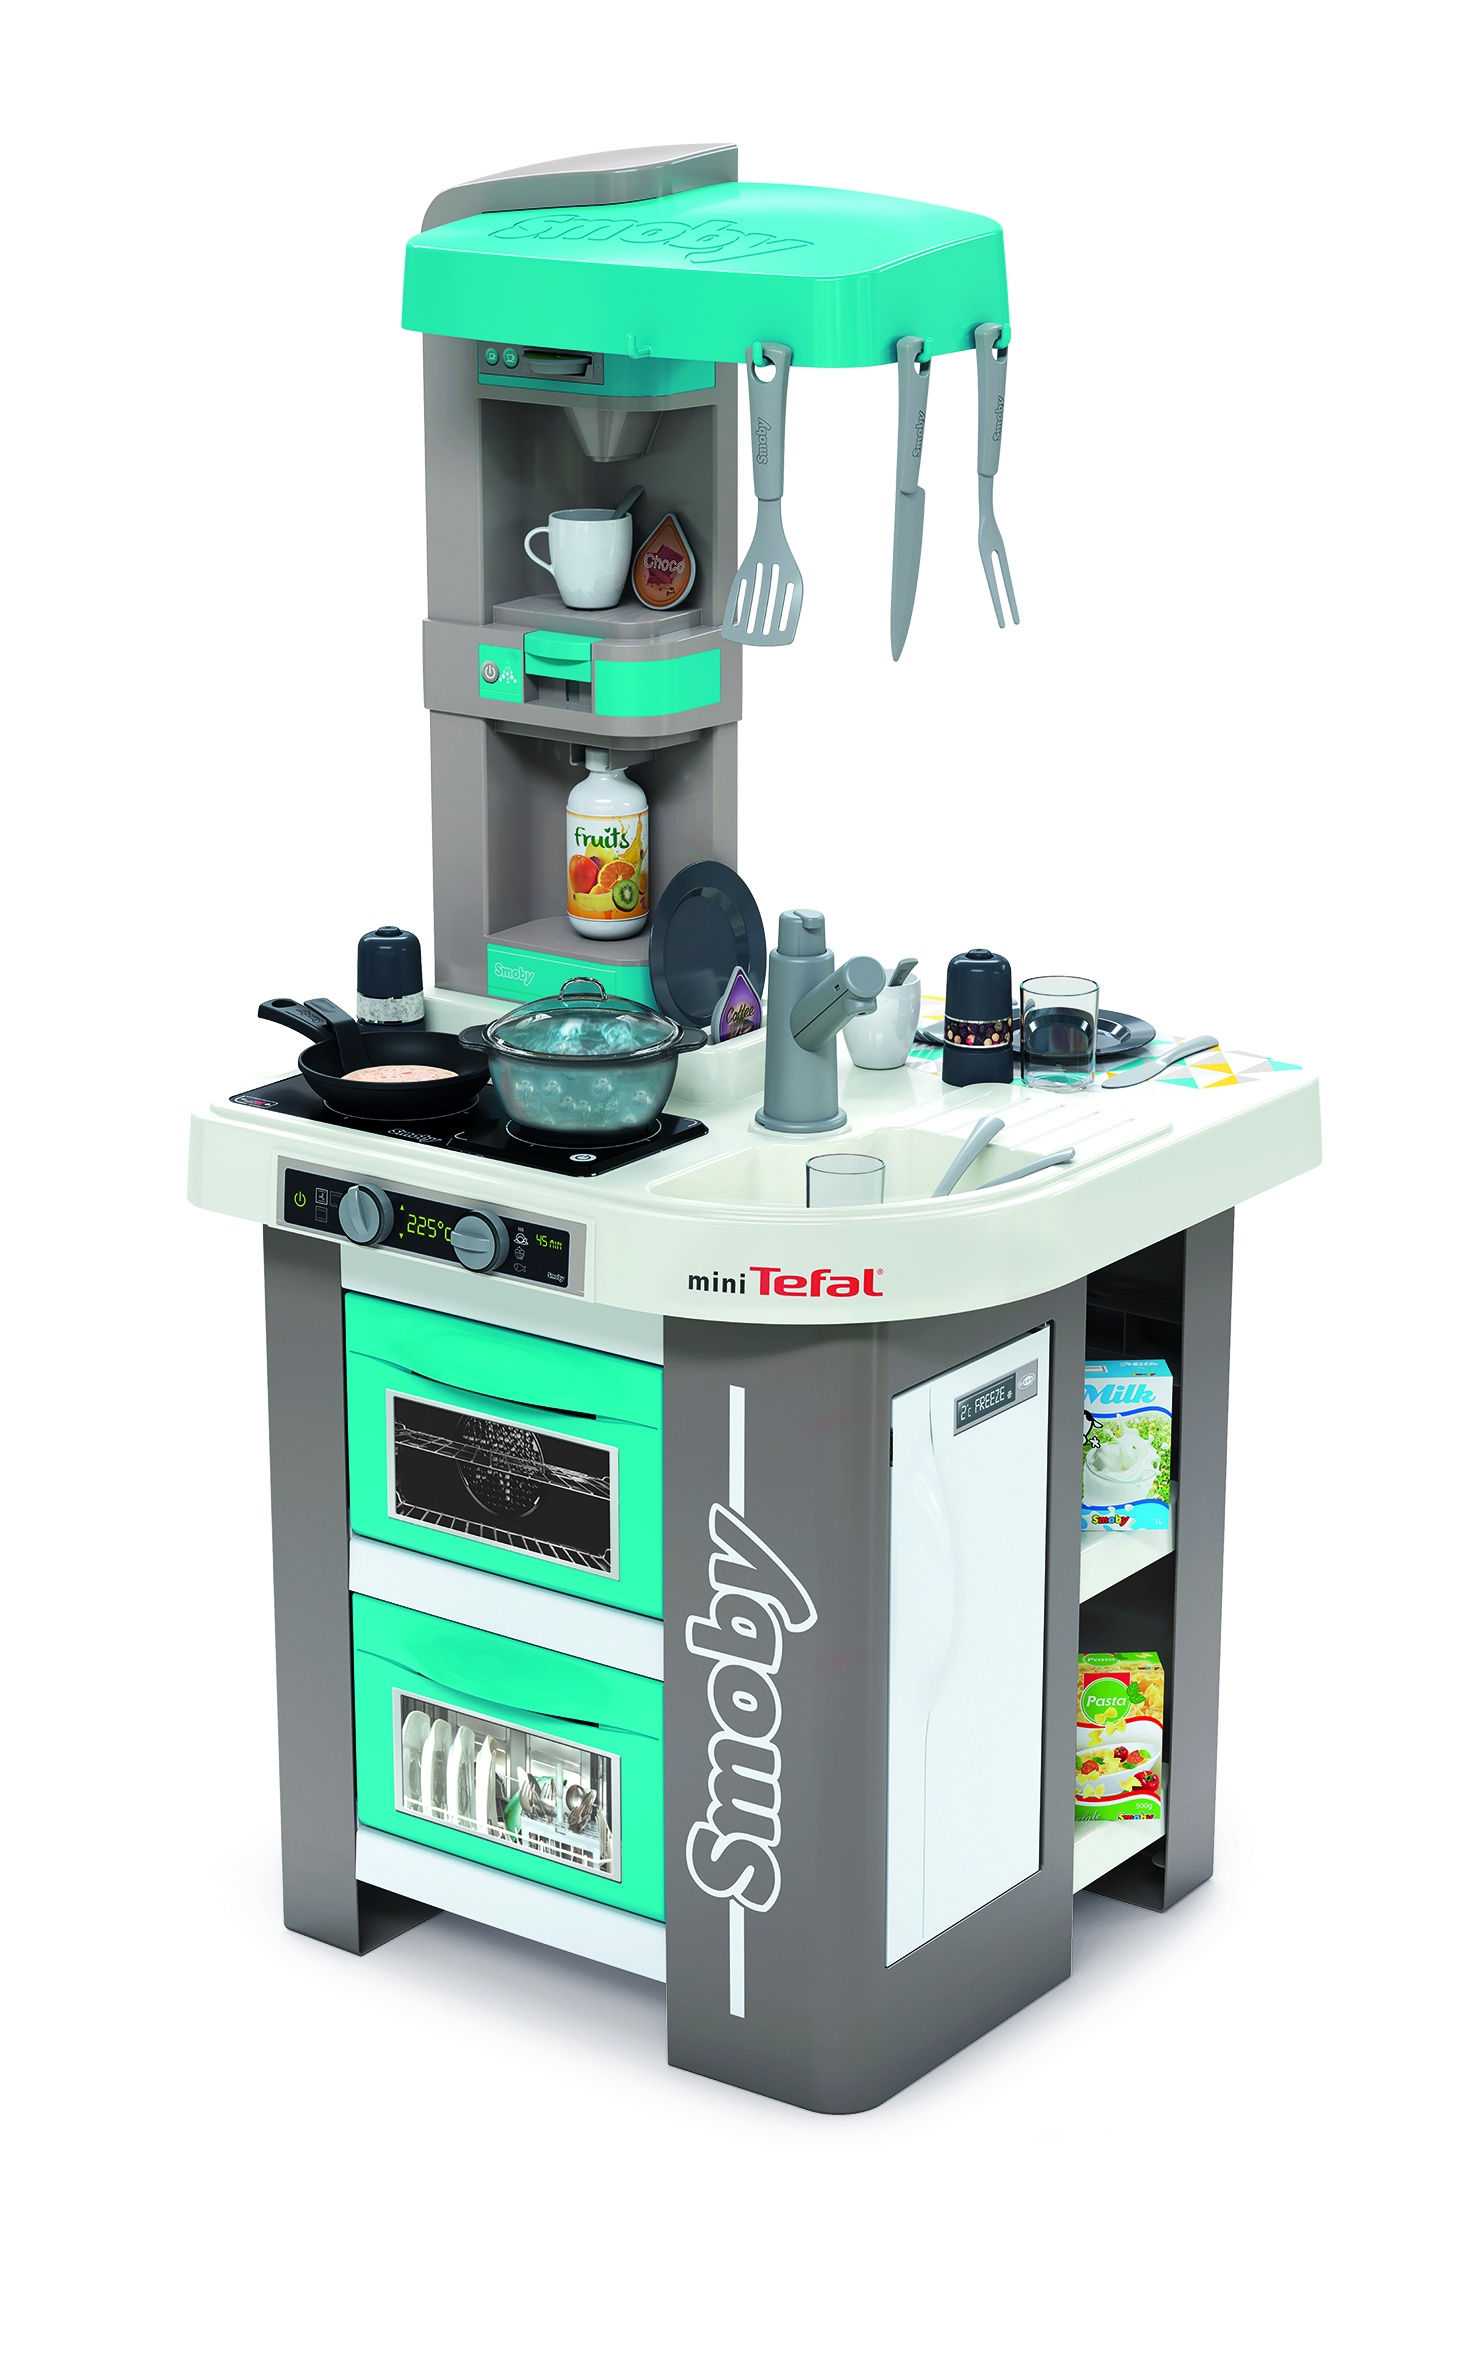 Кухня электронная Tefal Studio, пузырьки, 28 акс., 48х46,5х99 см smoby кухня электронная tefal super chef deluxe звук пузырьки 46 аксессуаров 311304